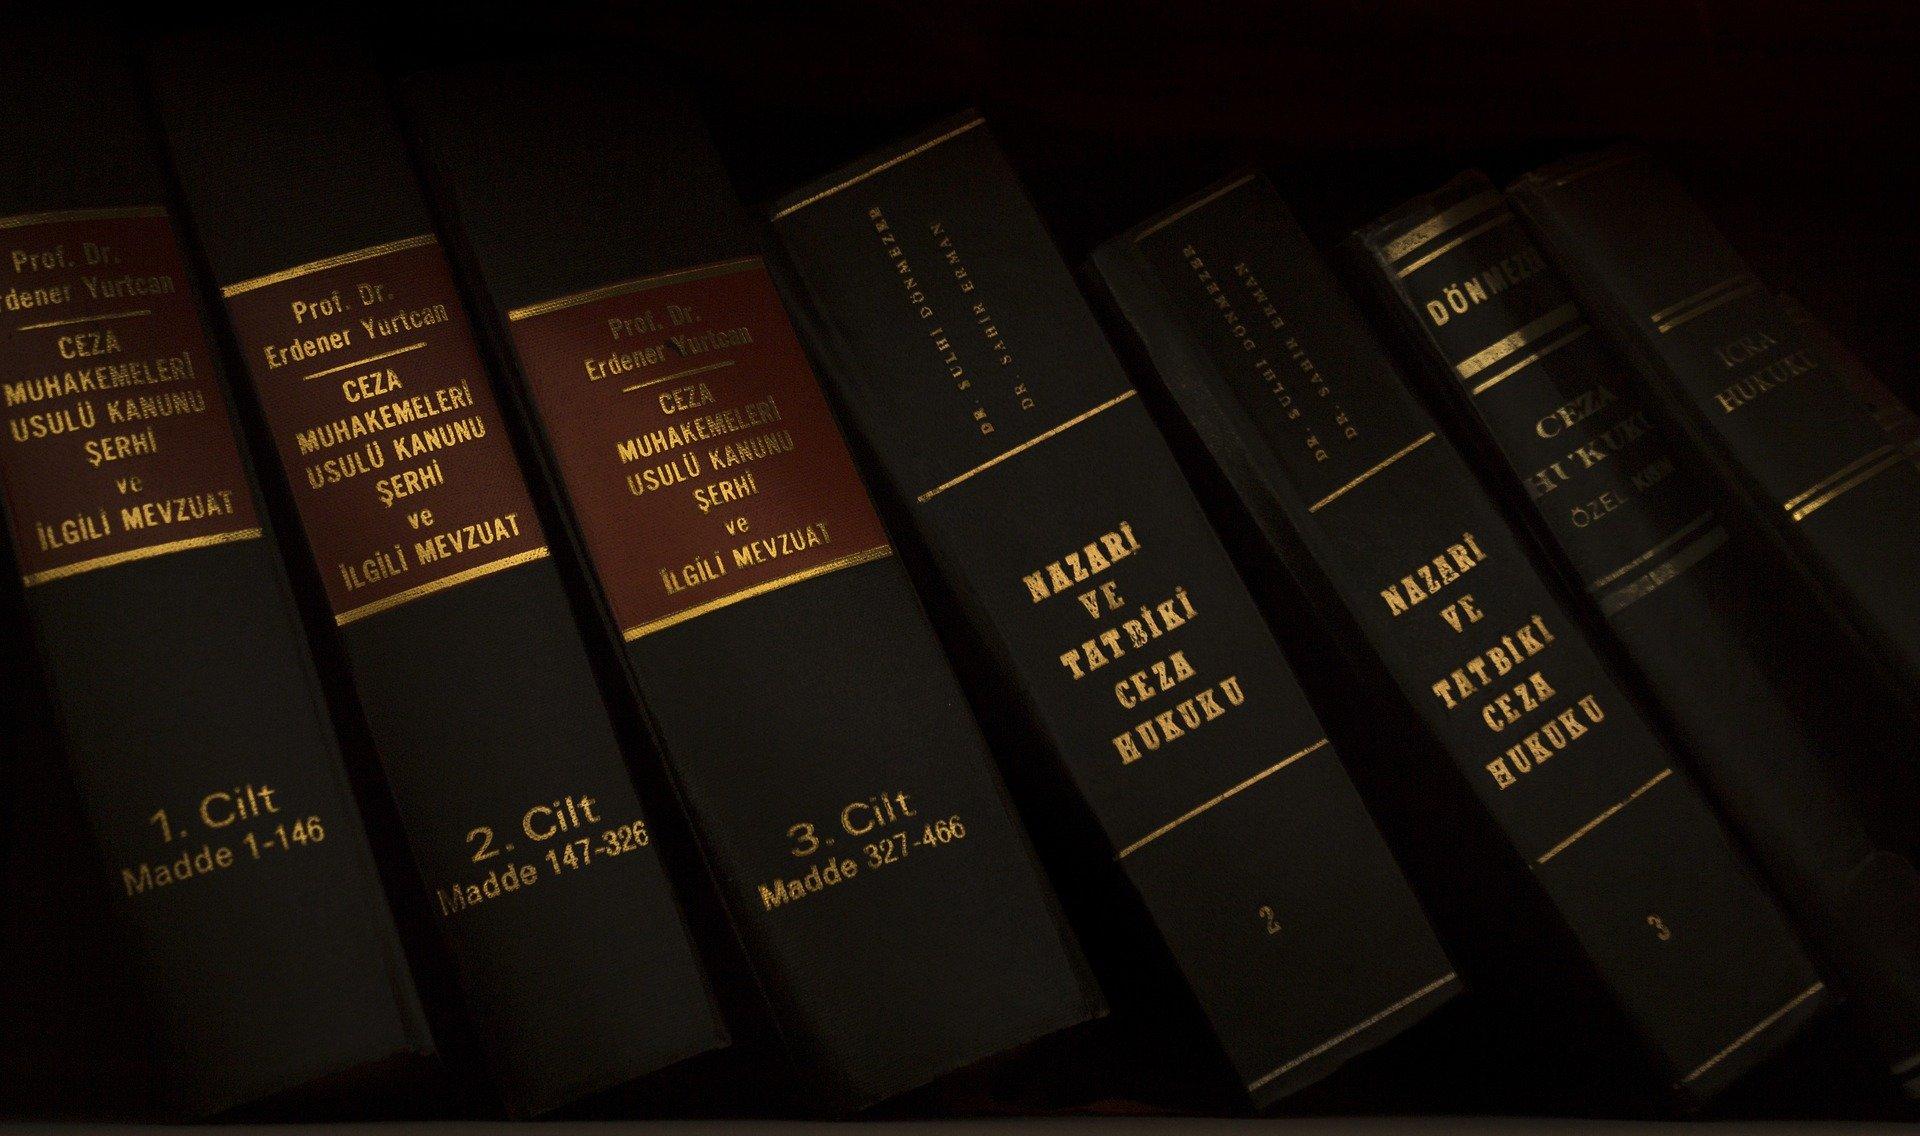 Justice Law Case Hearing Old Skin Book Bookshelf